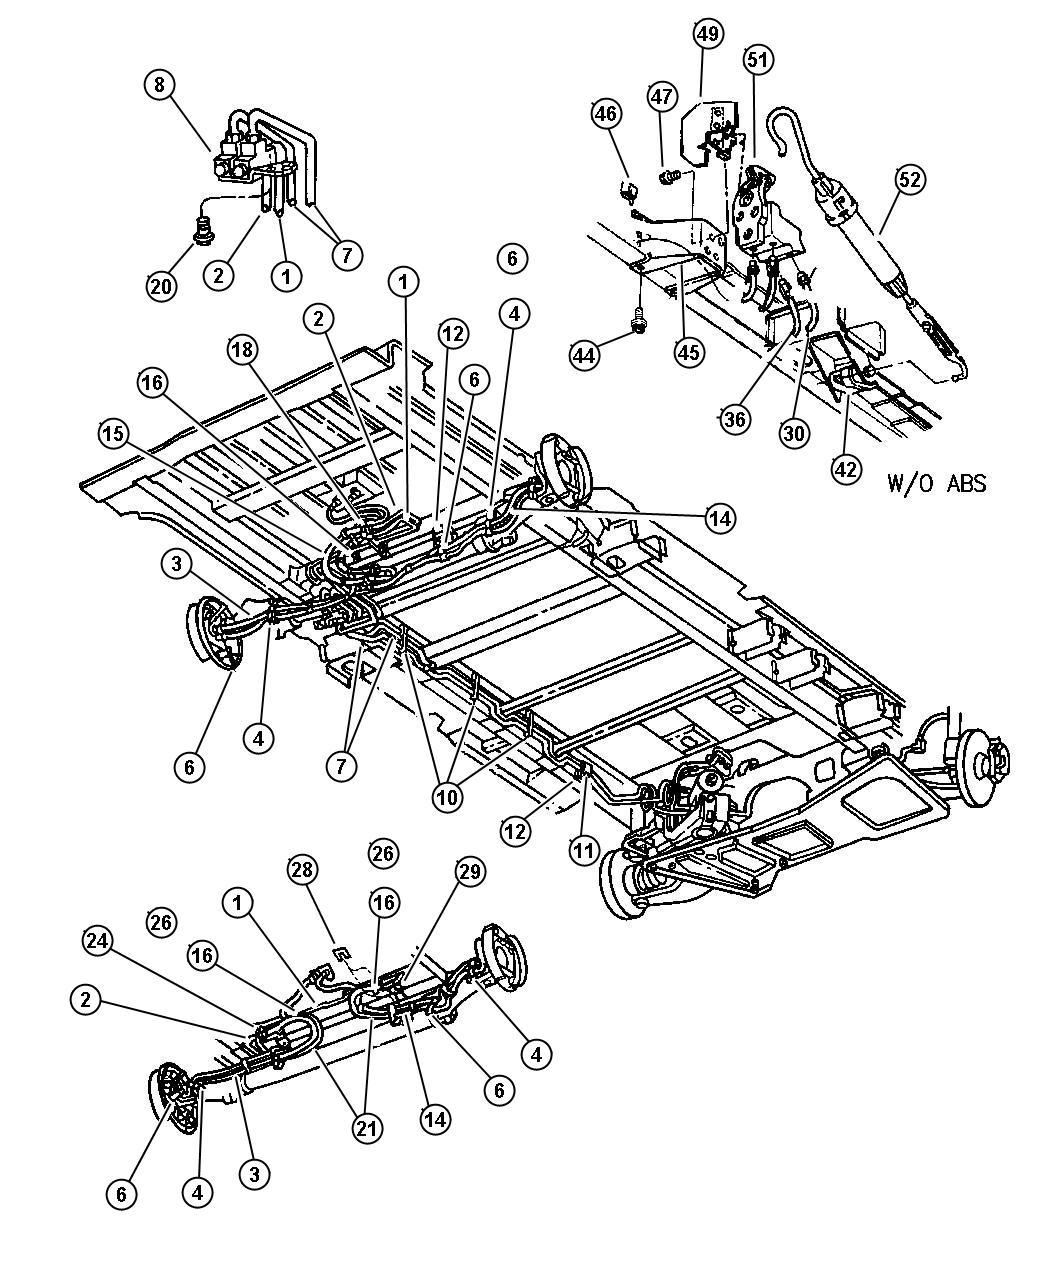 Diagram 1998 Plymouth Voyager Brake Line Diagram Full Version Hd Quality Line Diagram Hvacdiagrams Momentidifesta It